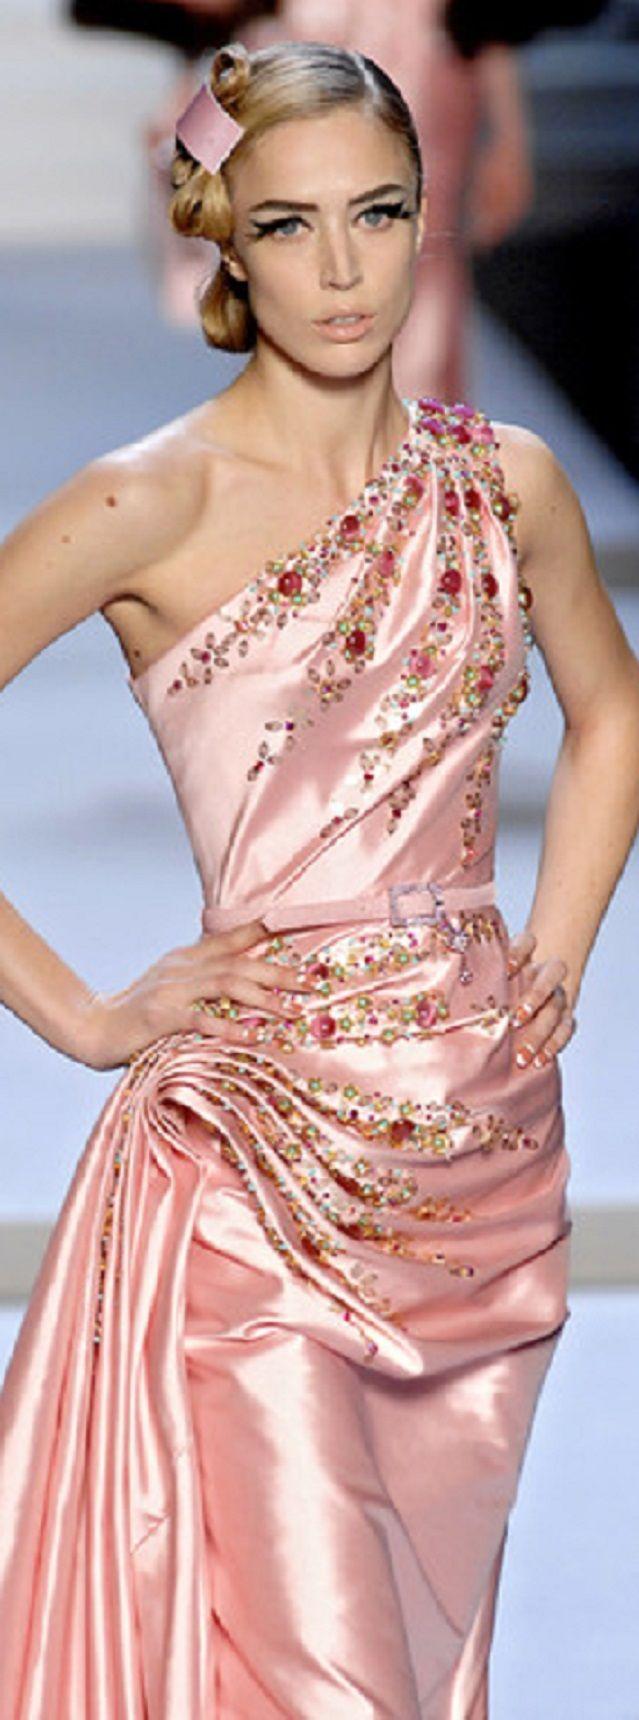 Christian Dior - fall 2007 - John Galliano | Vestidos de novia ...